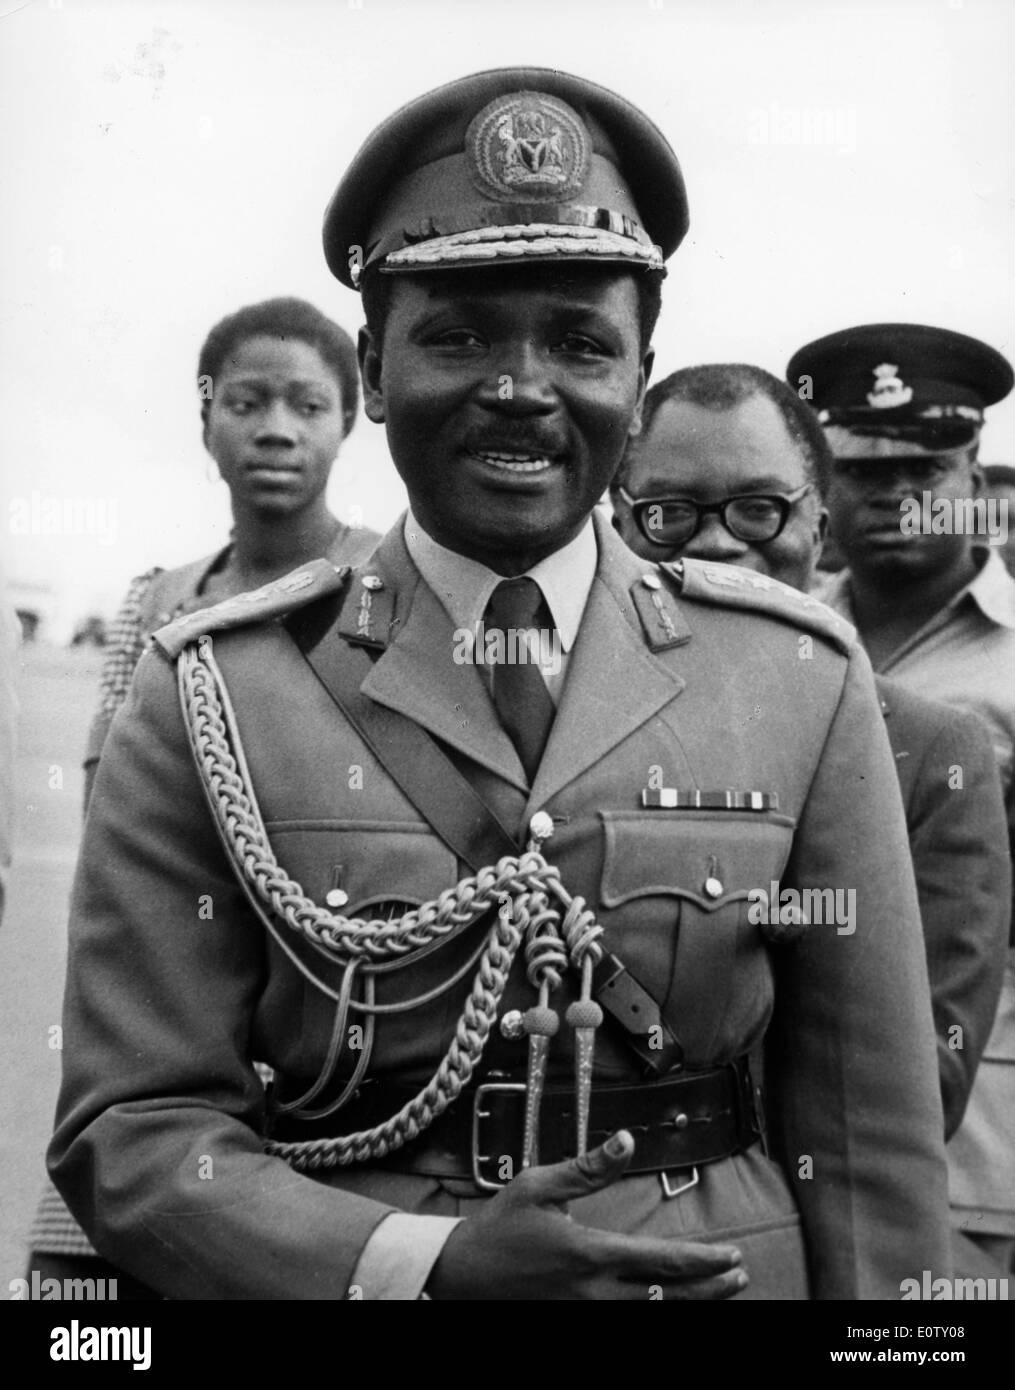 Head of State Yakubu Gowon walking in uniform - Stock Image